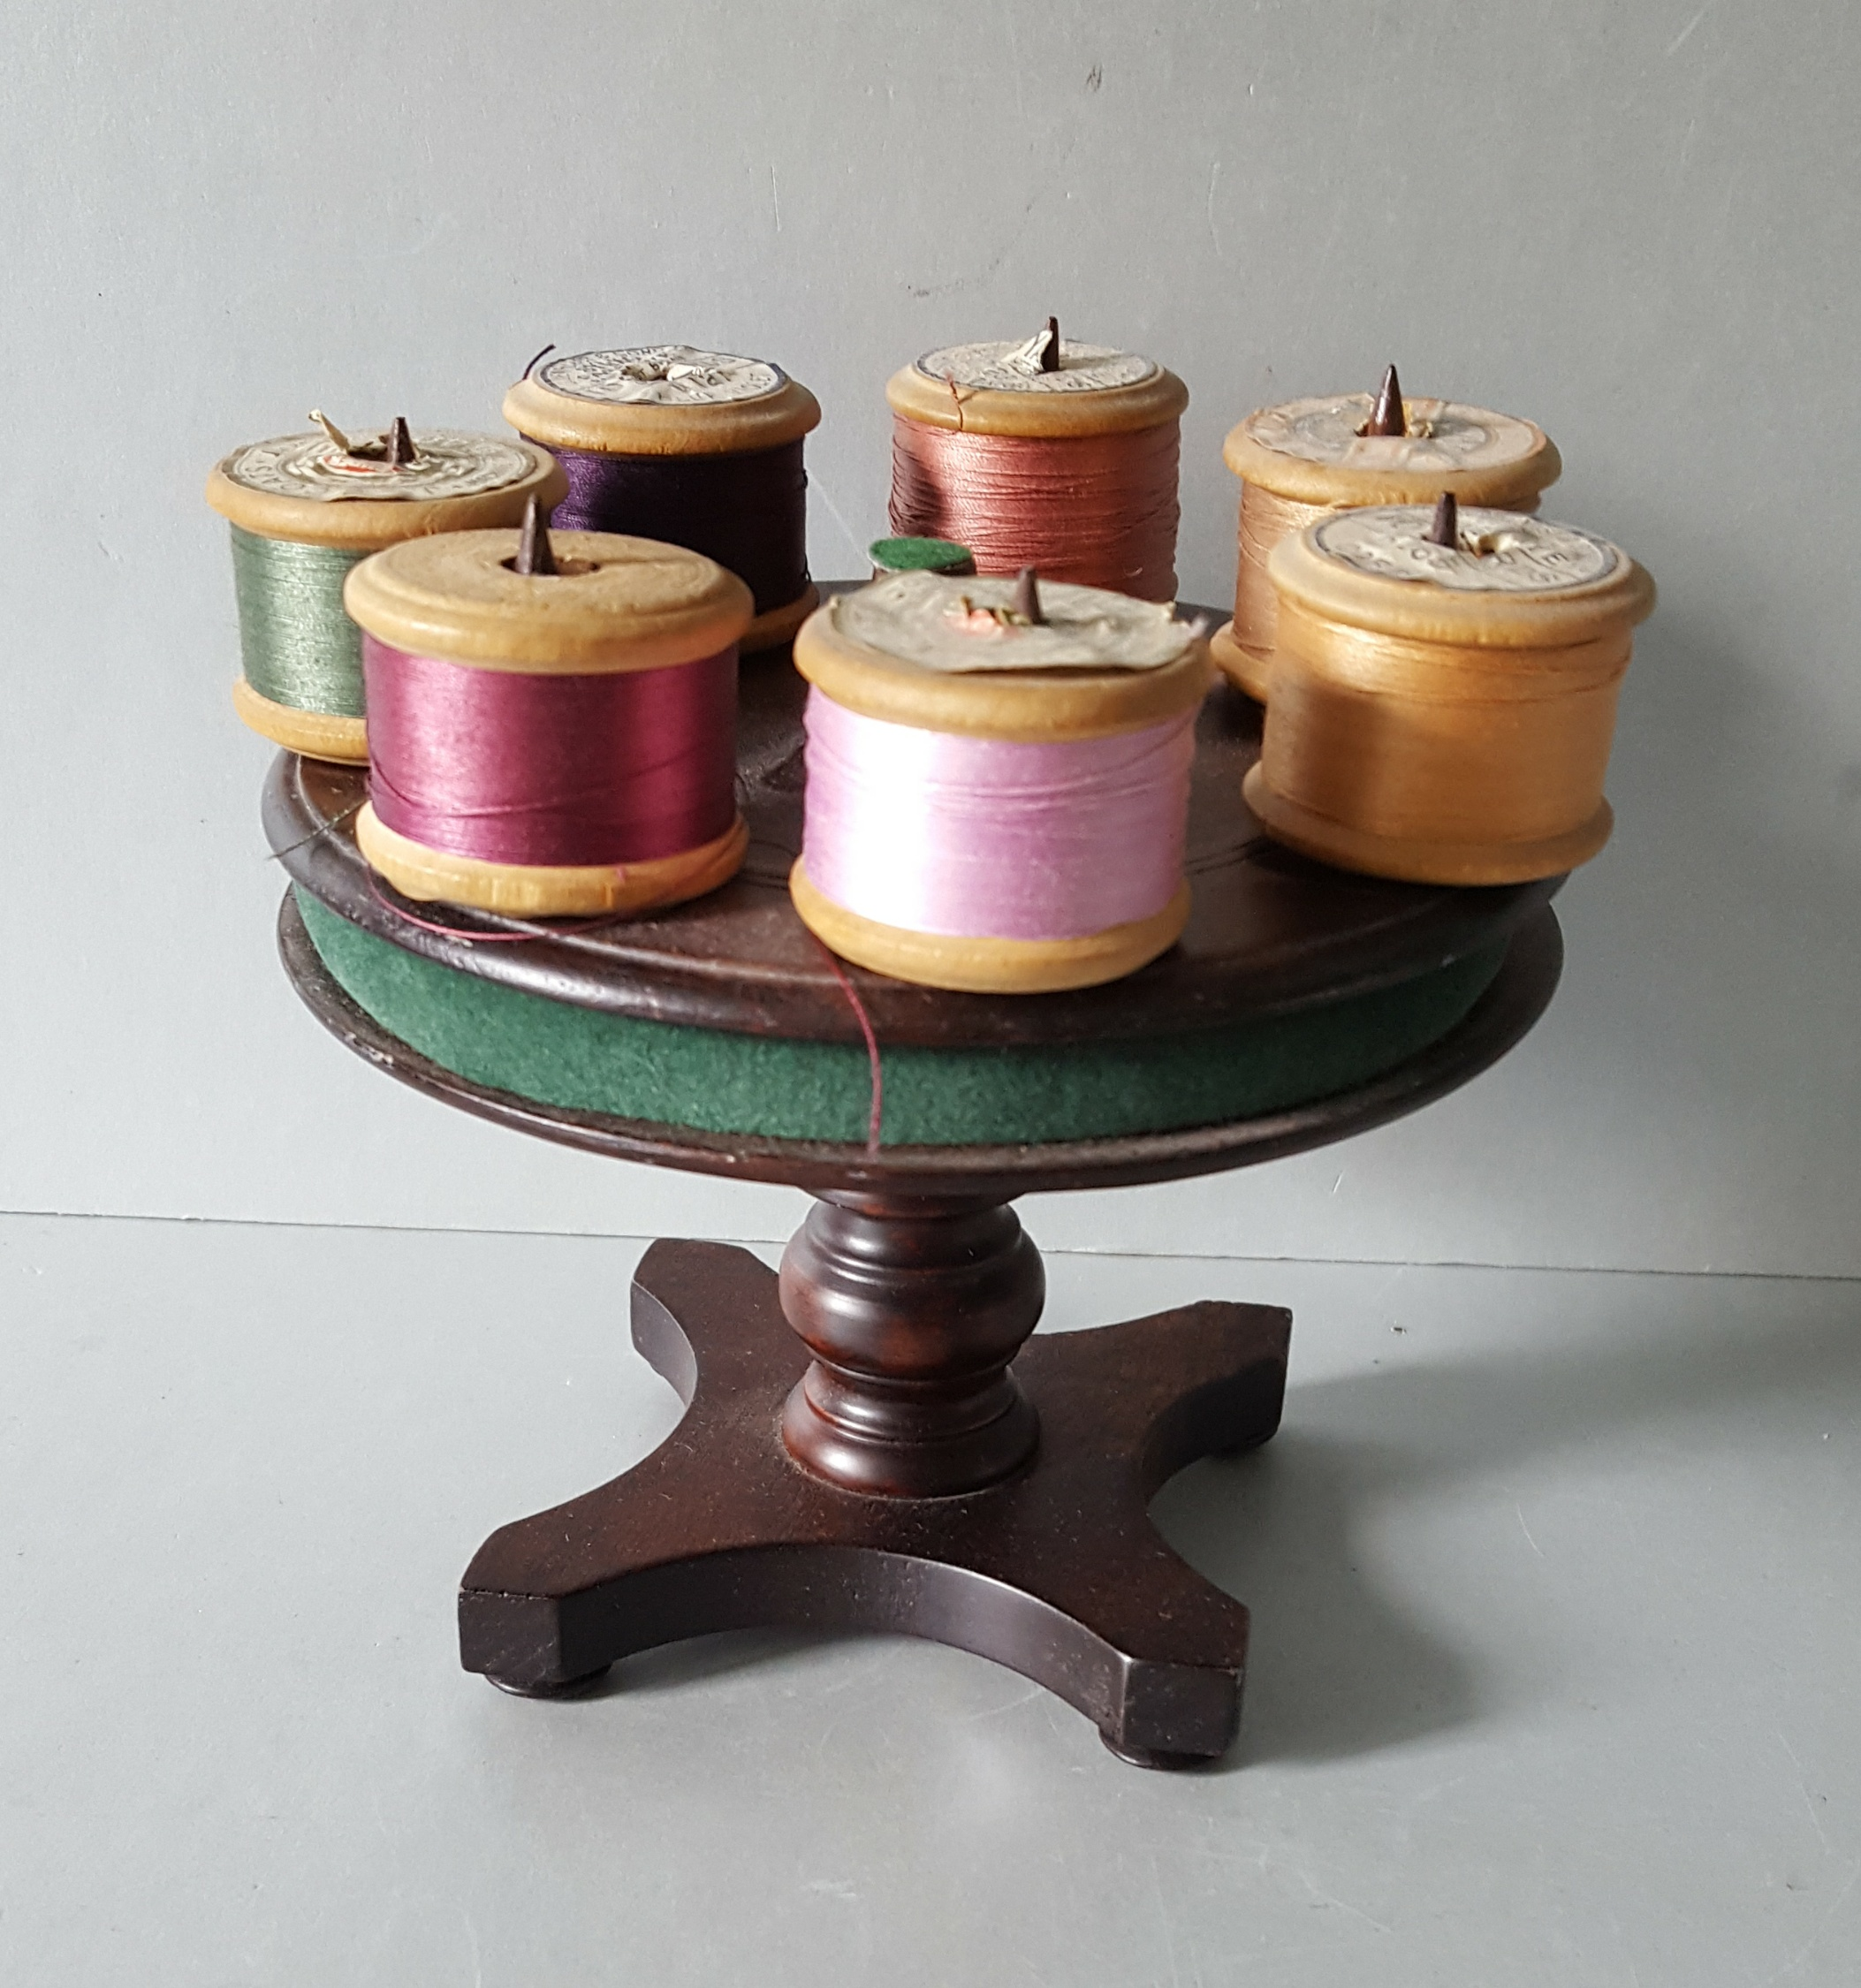 Lot 16 - Antique Vintage Wood Turntable Cotton Reel Holder & 3 Boxes